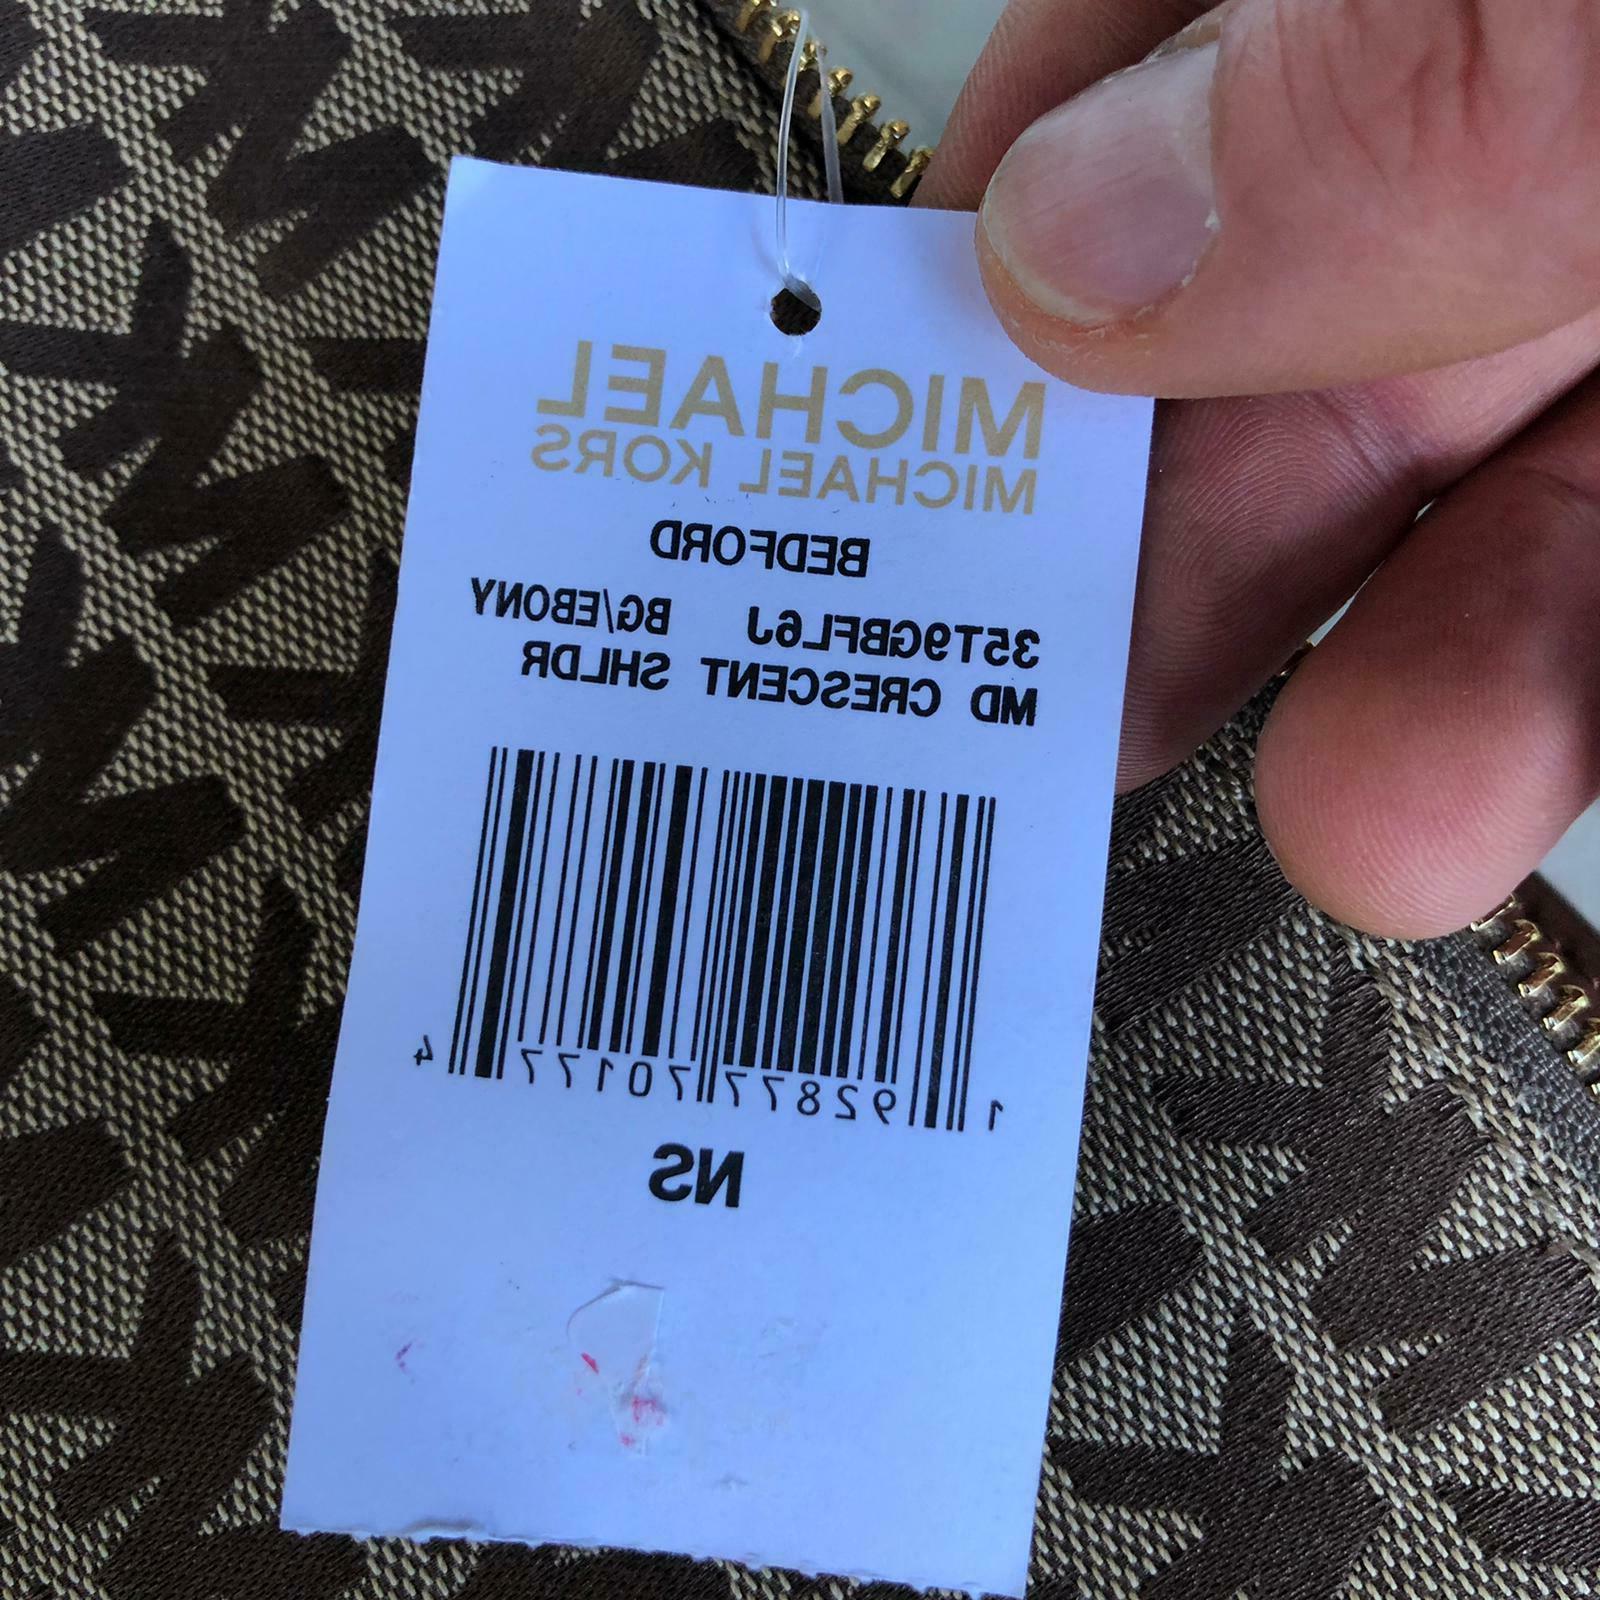 Michael Kors Women Jacquard Leather Shoulder Handbag Purse Hobo